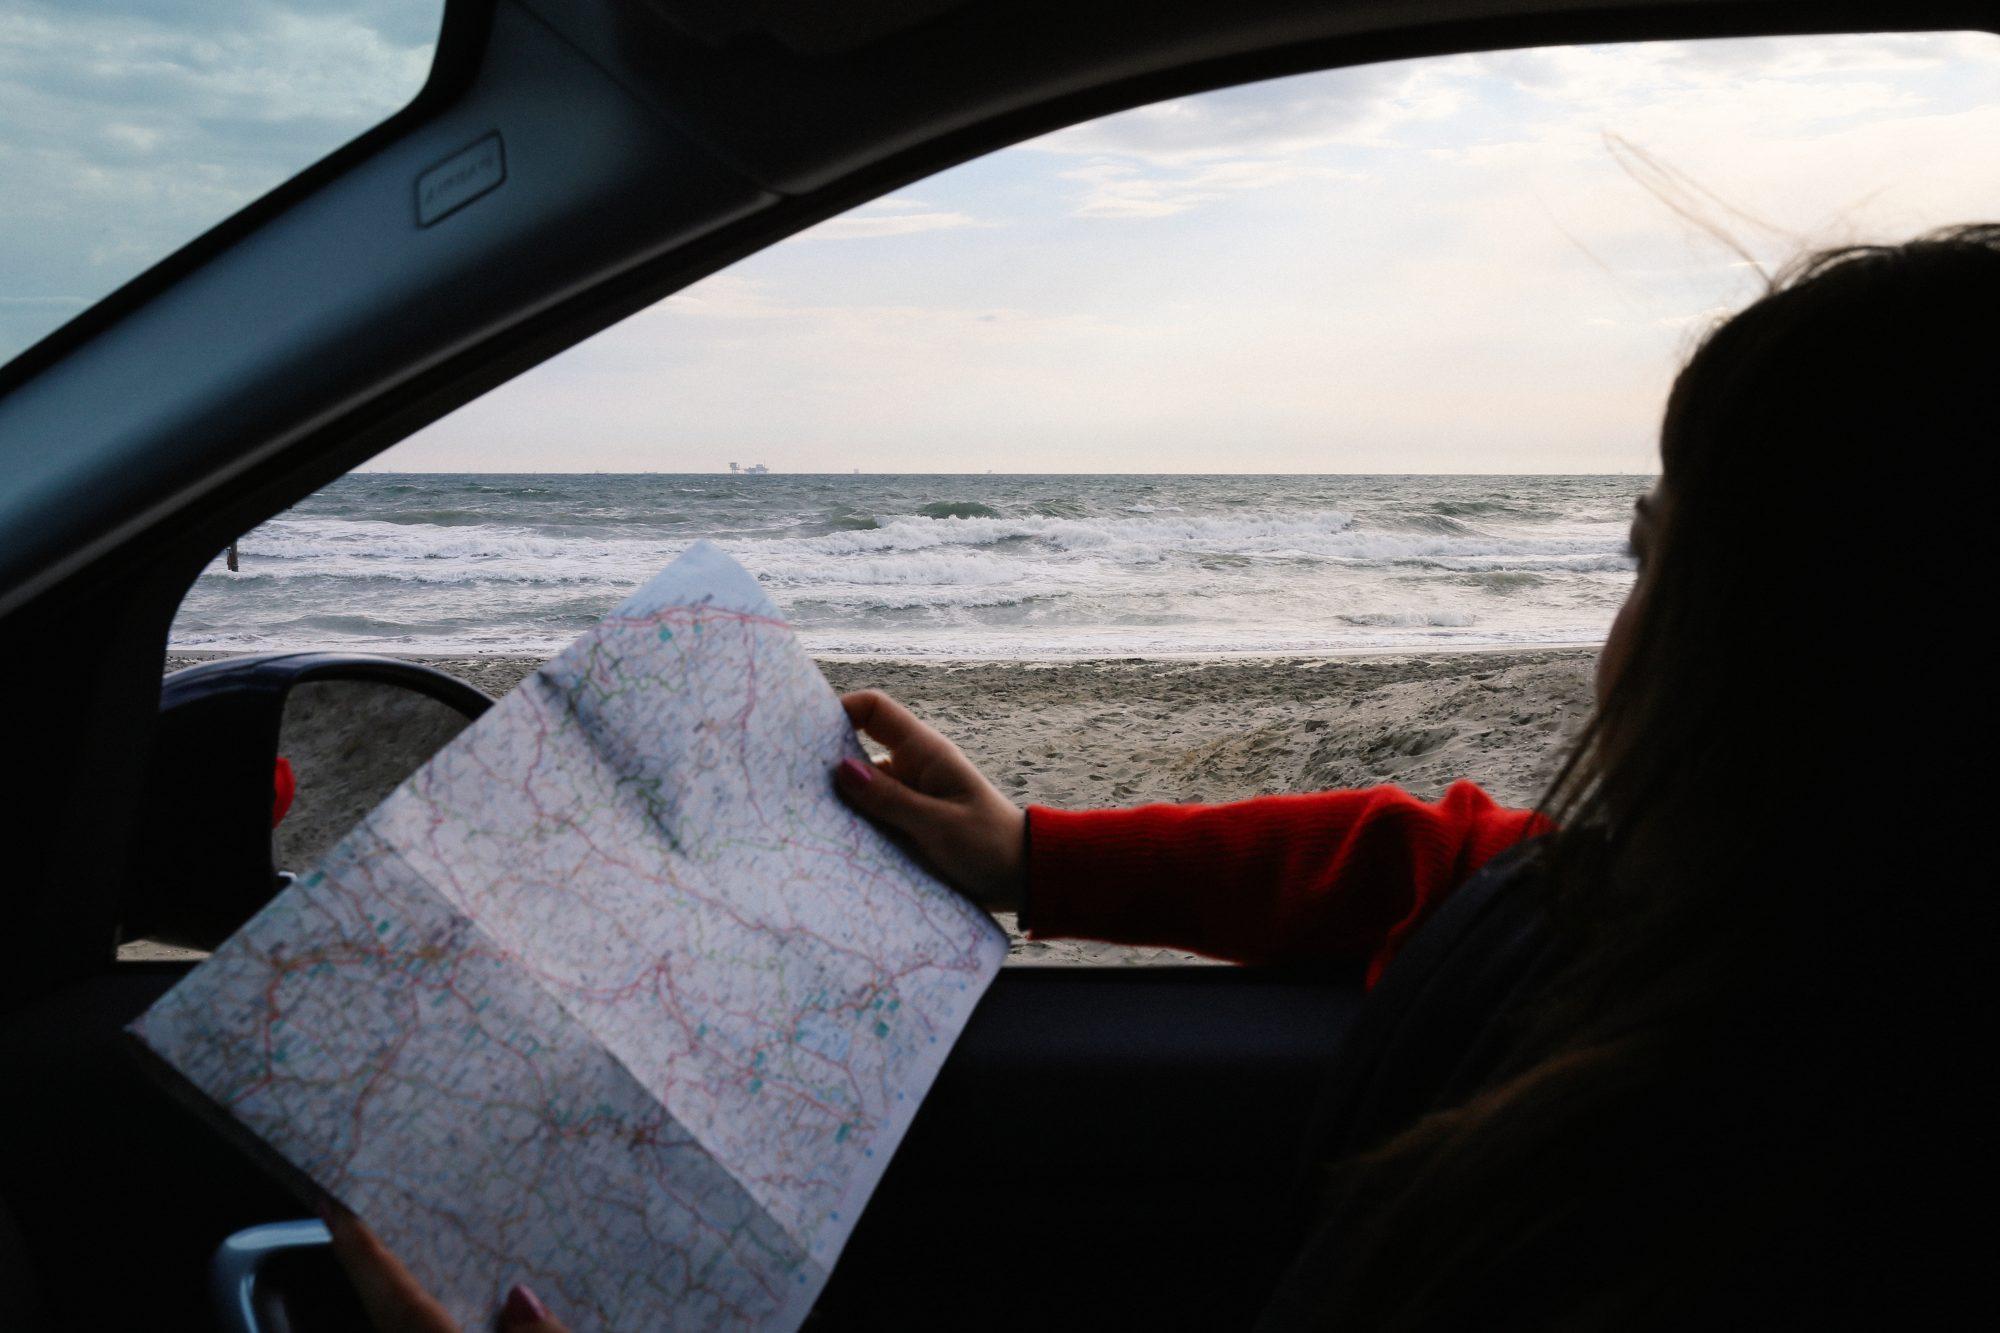 LandOutriders - Un weekend in Romagna con Pier Giulio Caivano | Collater.al 8